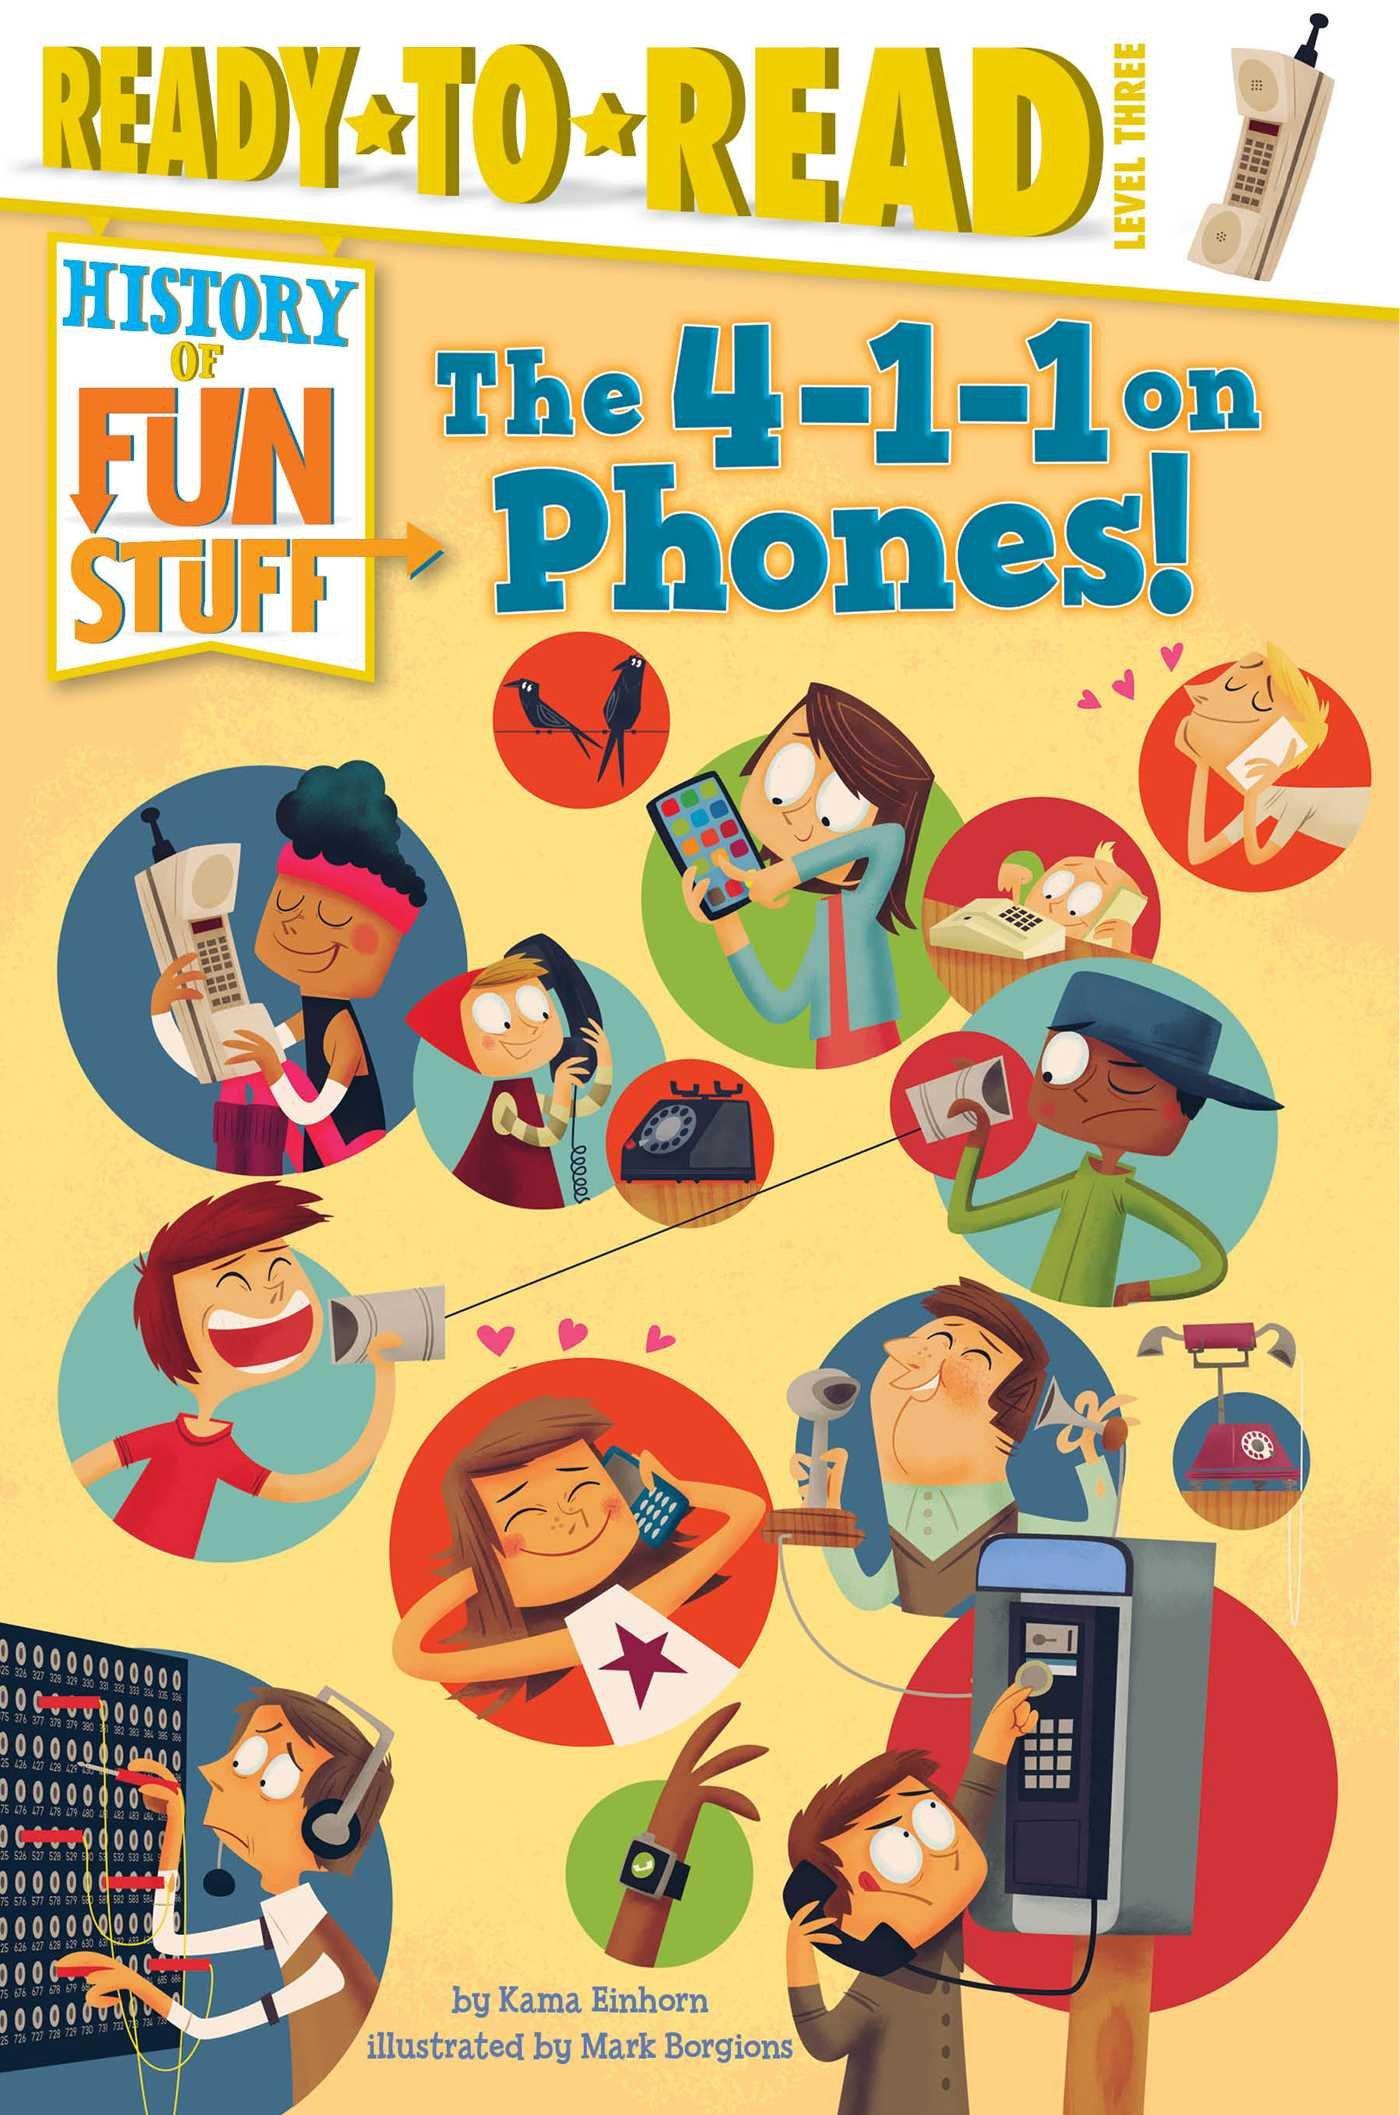 The 4-1-1 on Phones! (History of Fun Stuff) PDF